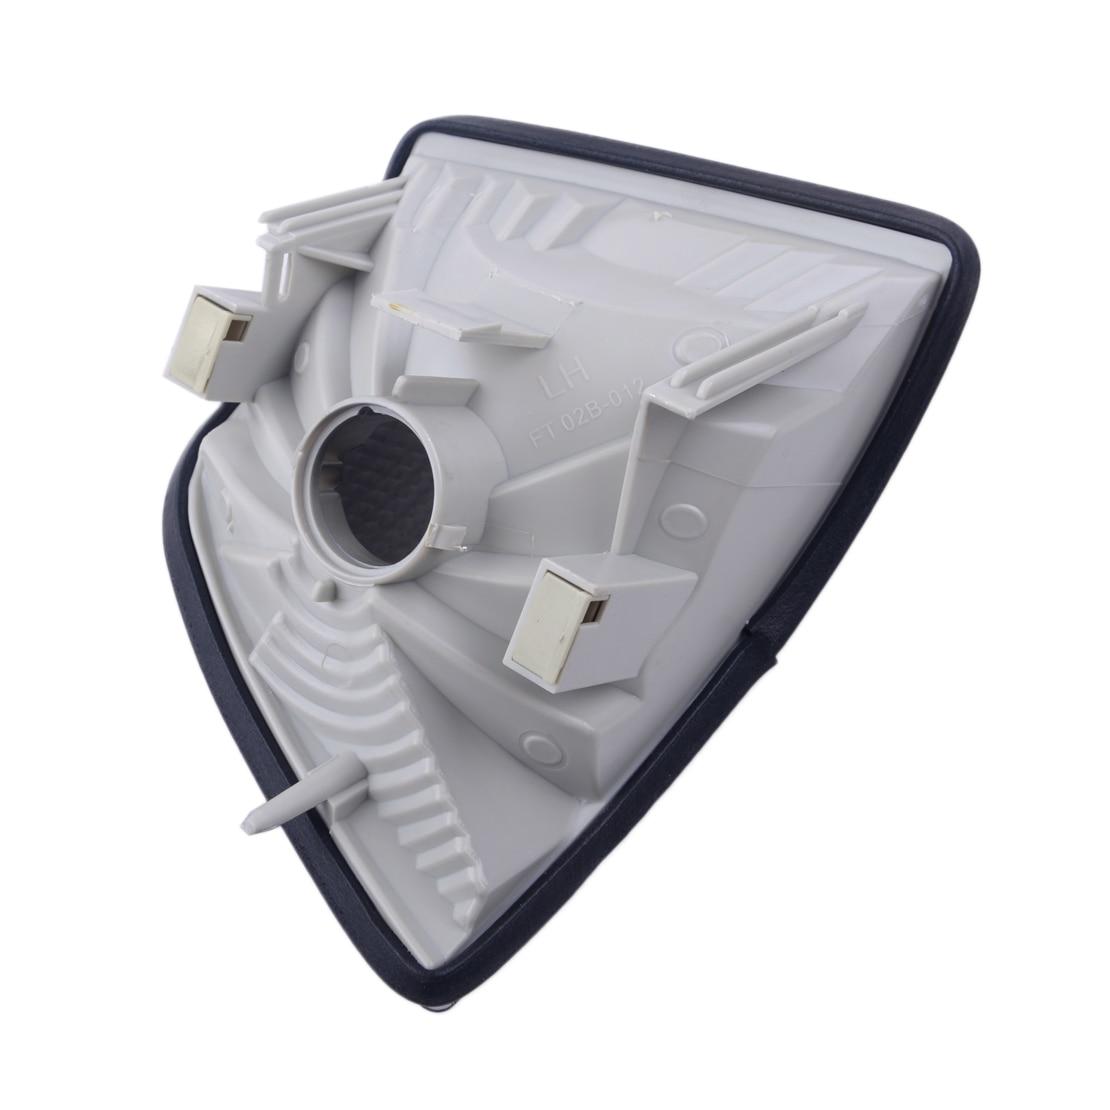 DWCX Left Corner Smoke Turn Signal Lights Lens Case Plastic Fit For BMW E36 3-Series 2DR Coupe Convertible 1992-1996 1997 1998